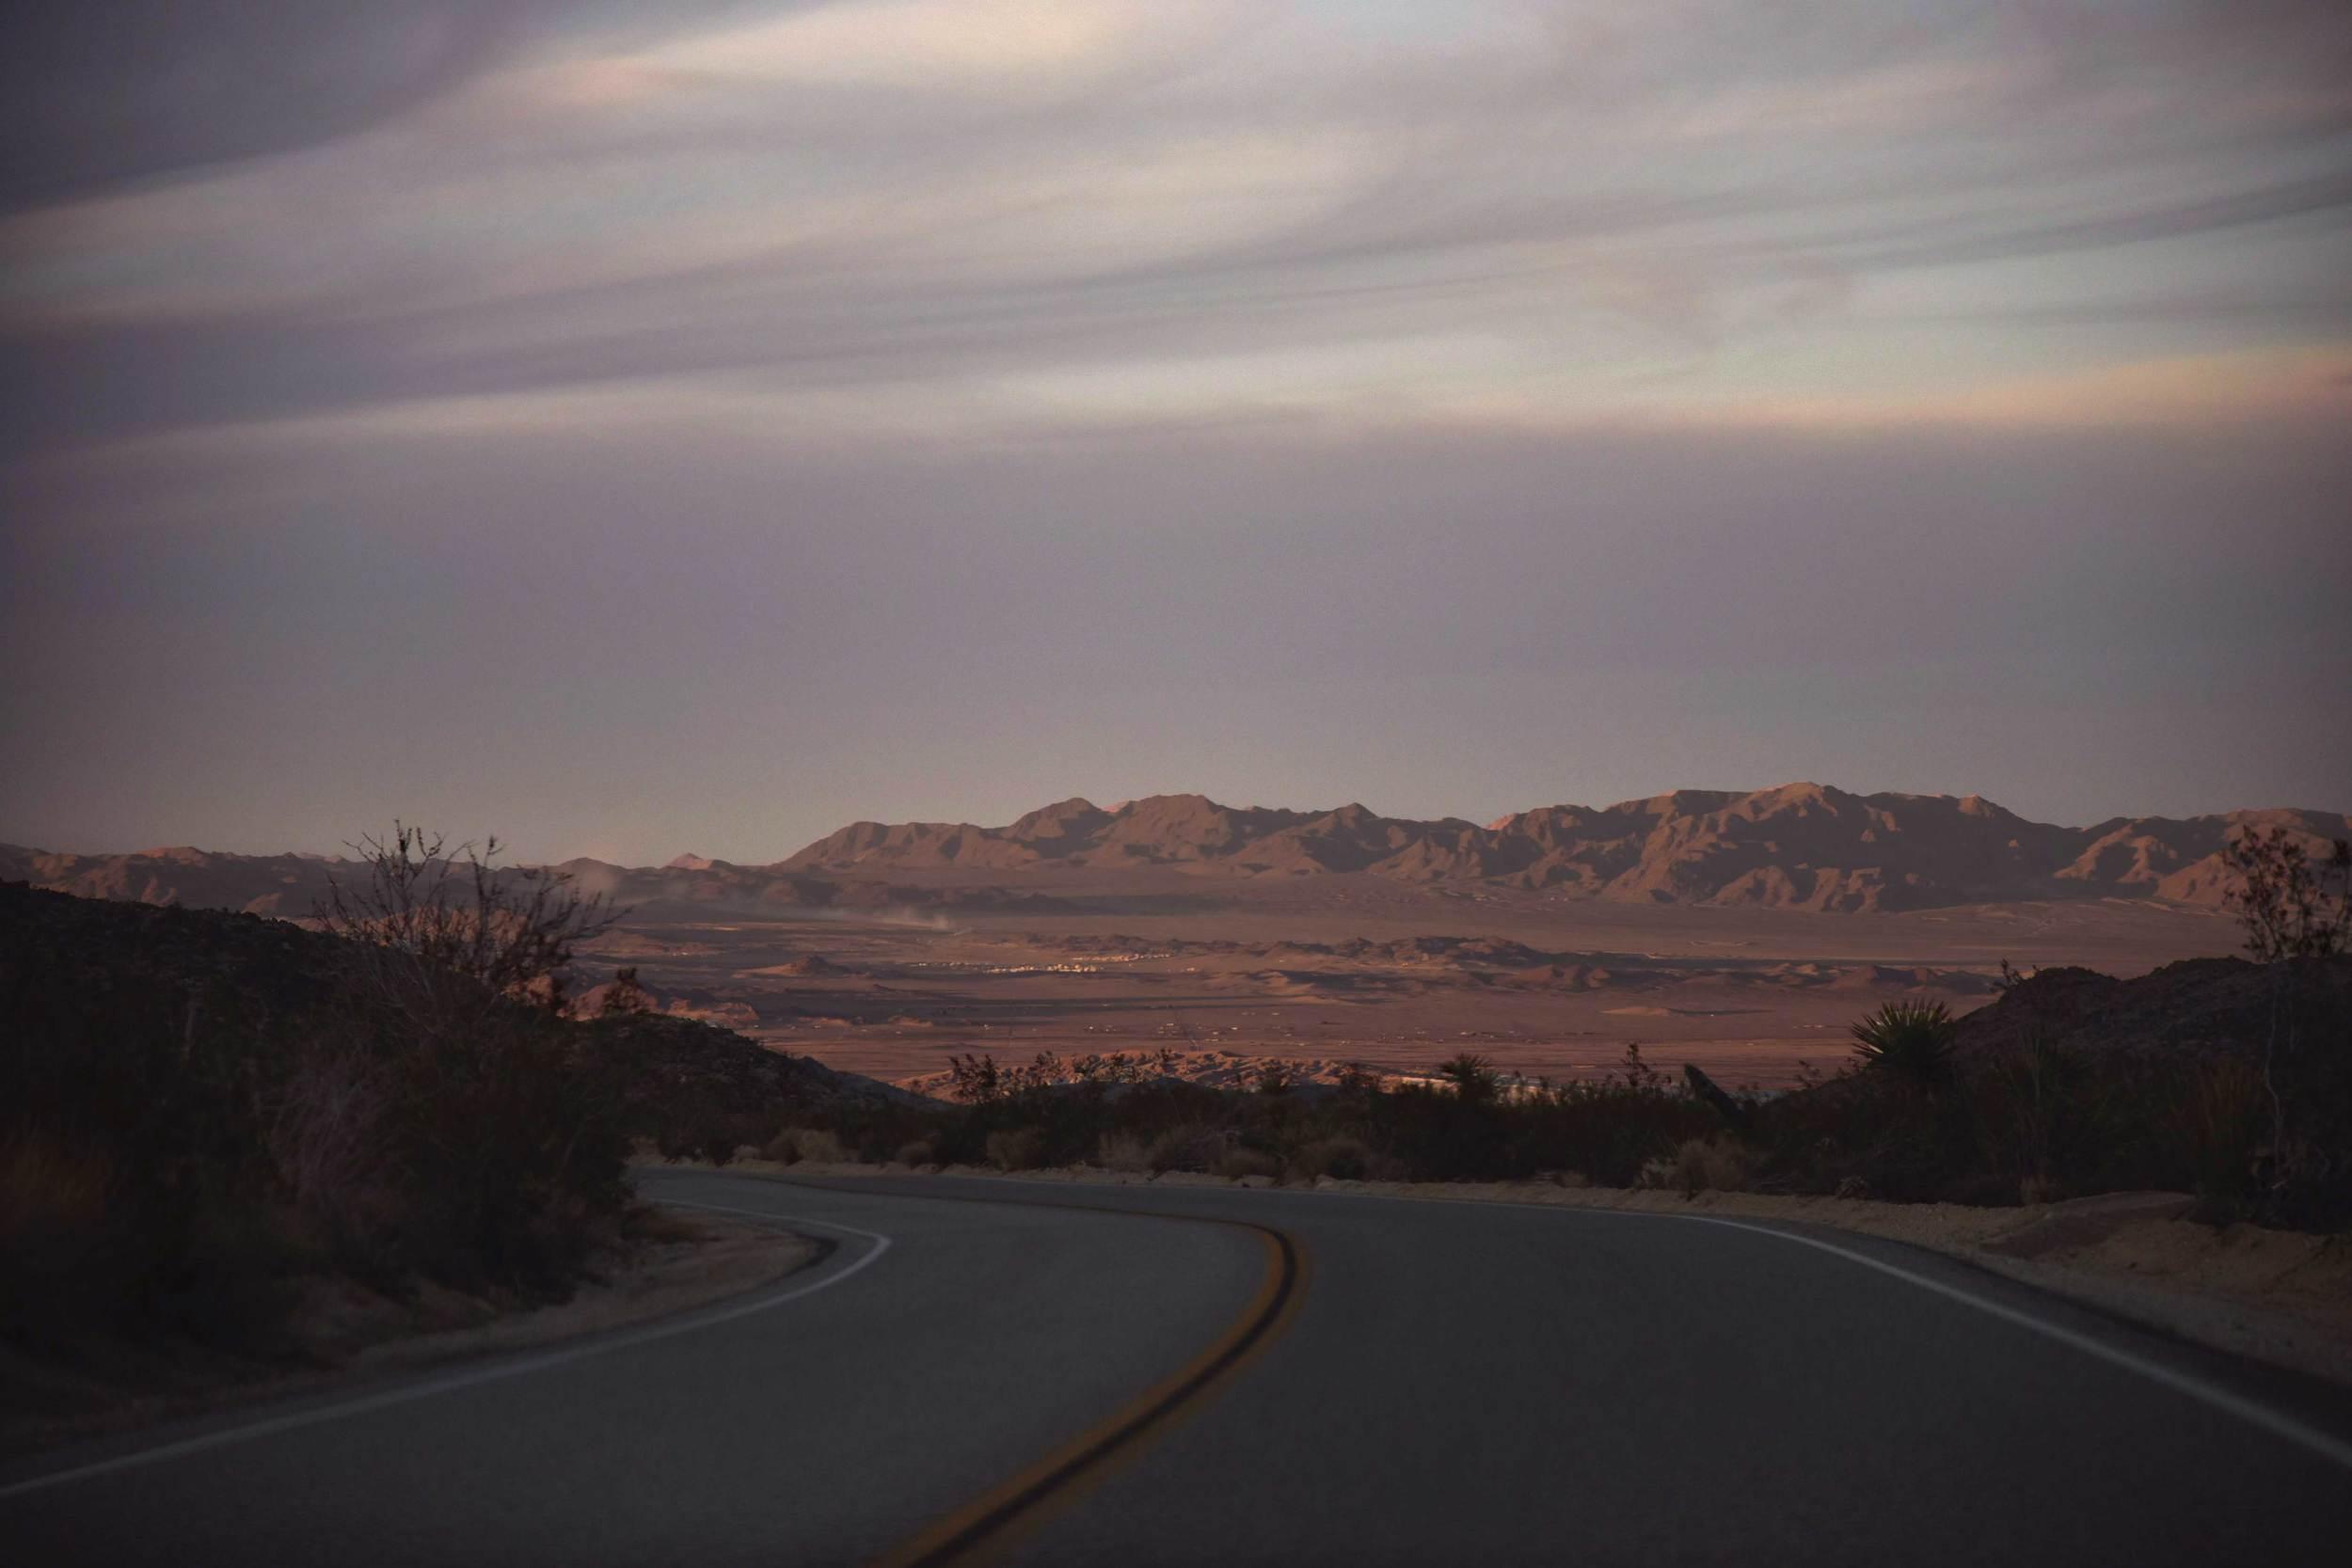 Sunset drive,Joshua Tree National Park, Southern California, USA. Image©thingstodot.com